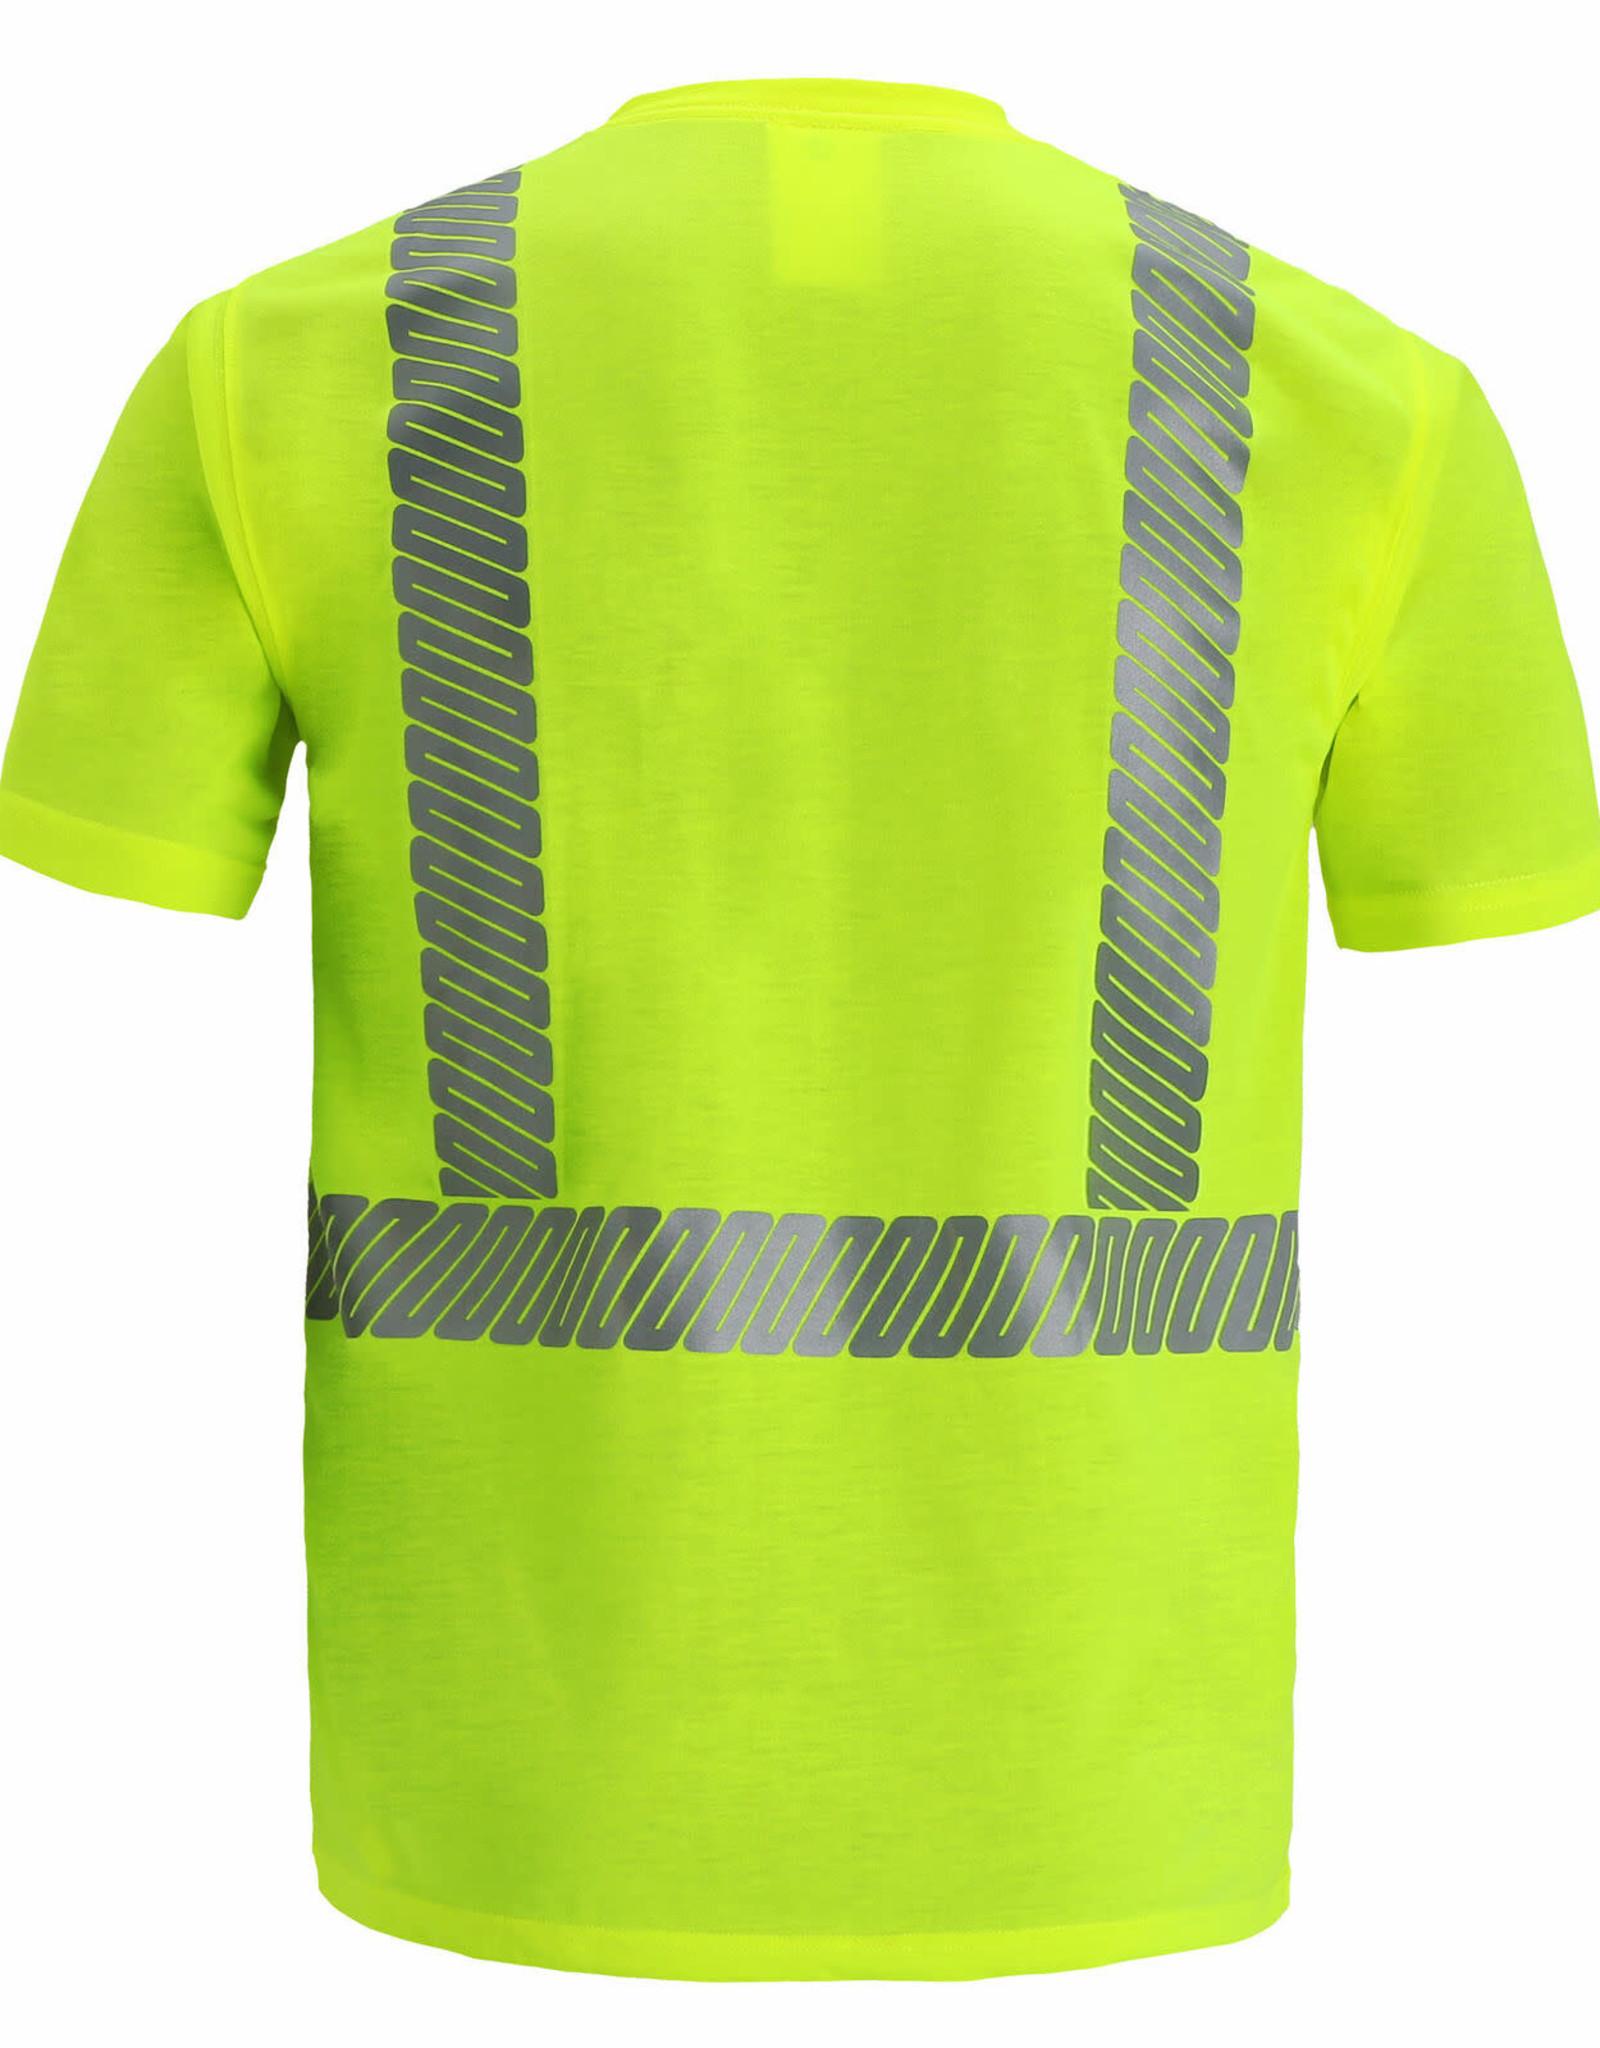 High Viz Lime Short Sleeve T-Shirt, TS105C-2, SZ. XL